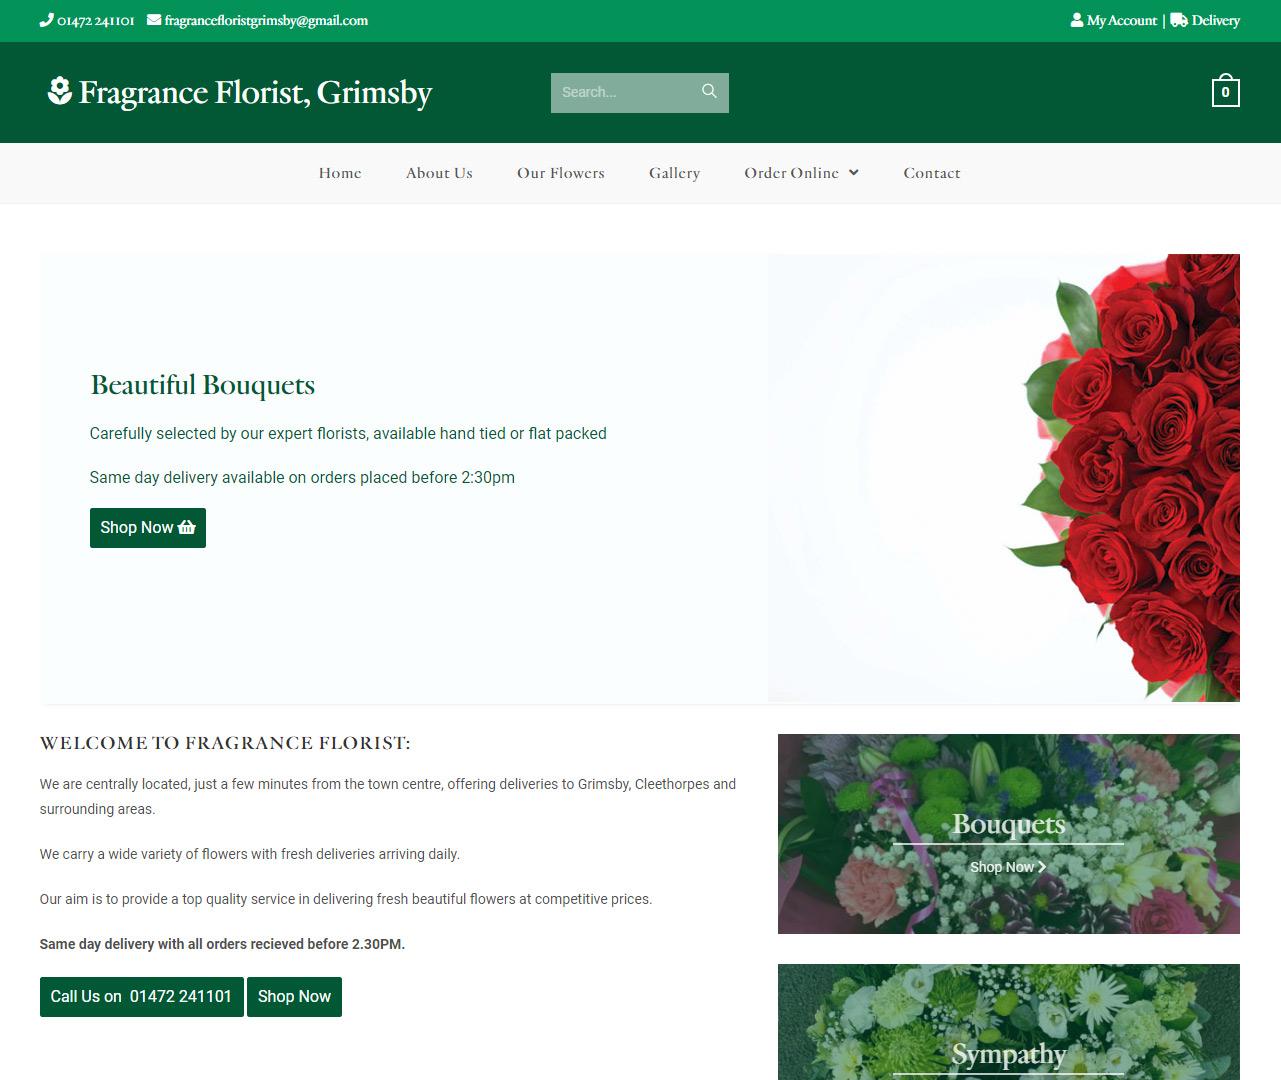 Fragrance Florist